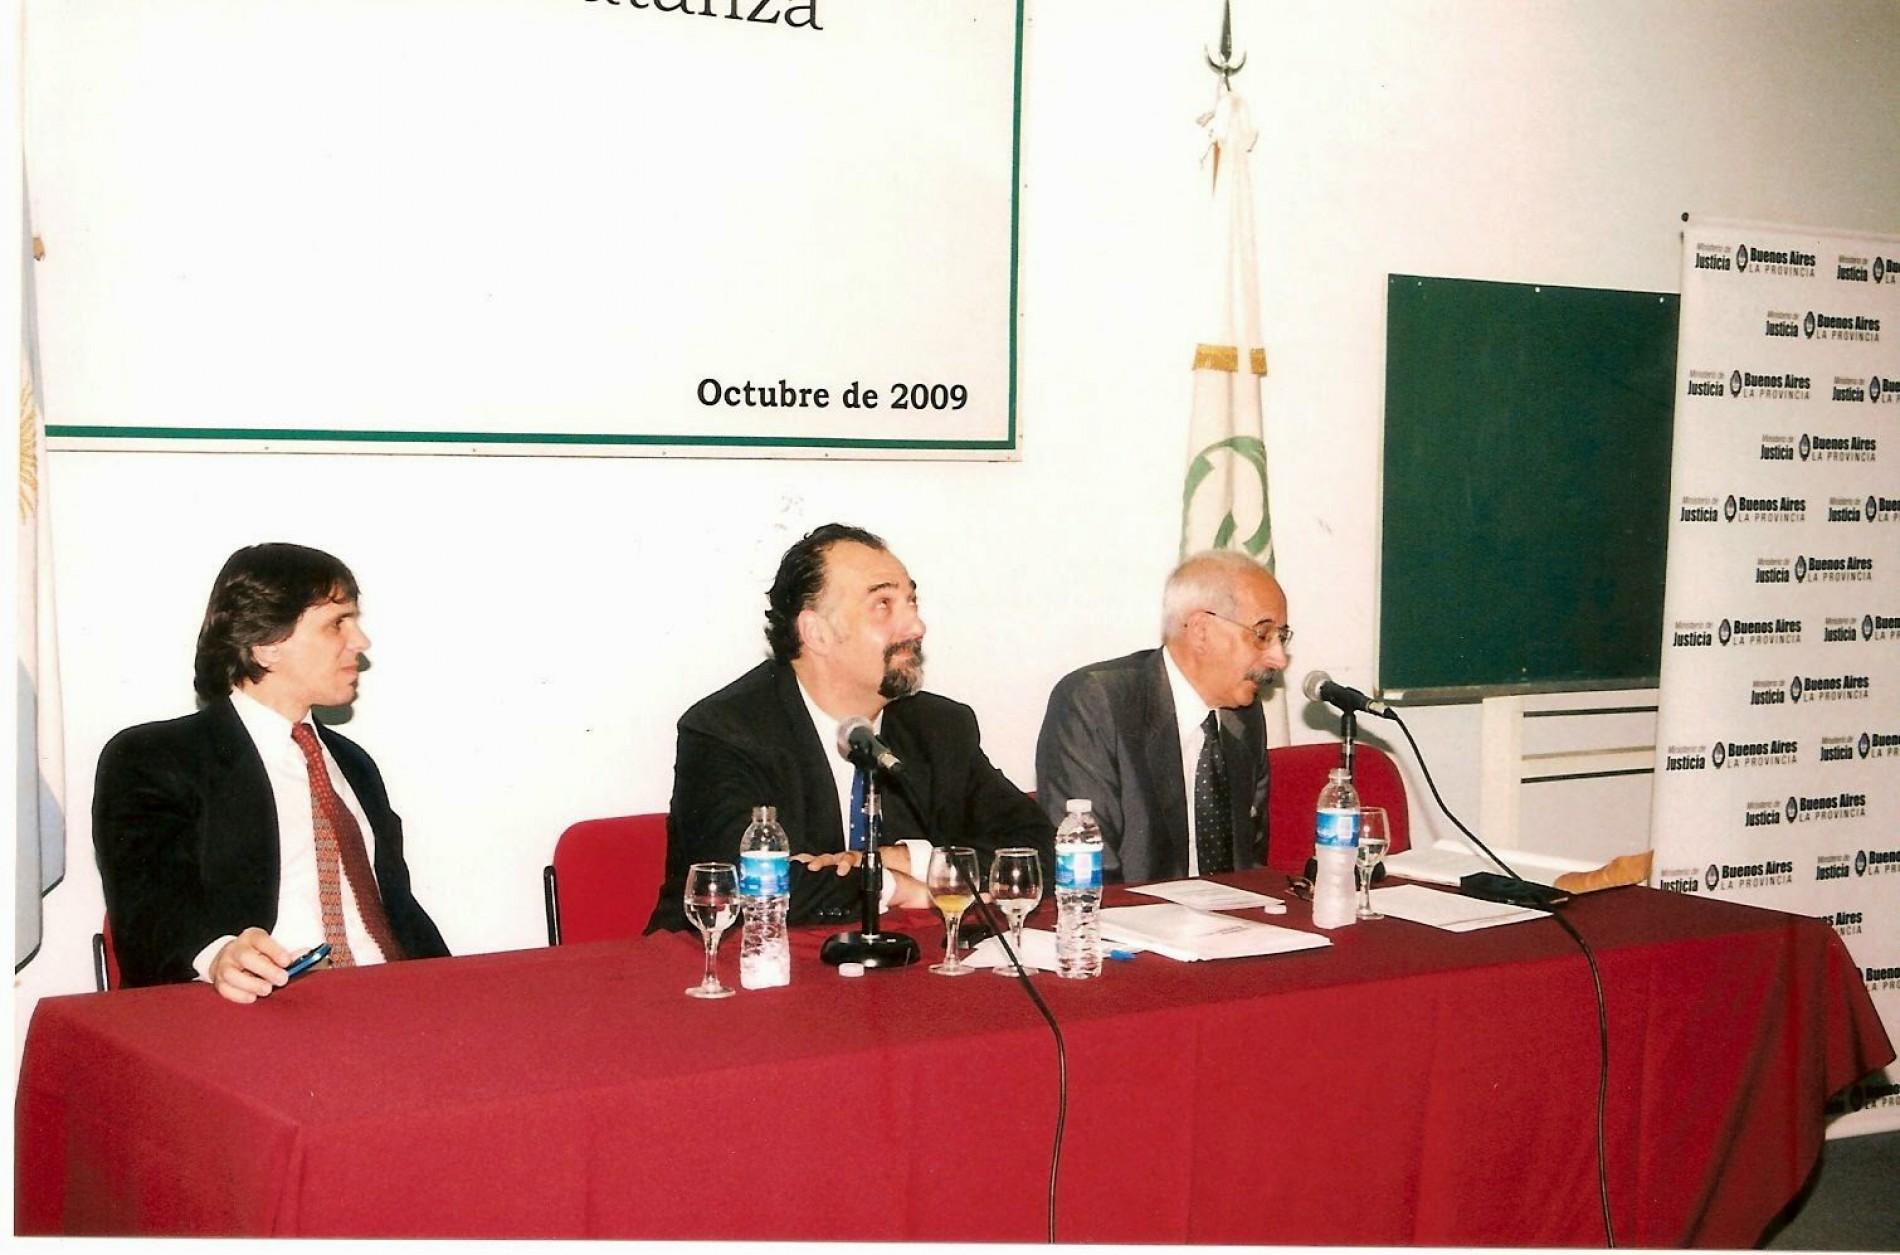 El Ministro de Justicia Bonaerense en La Matanza